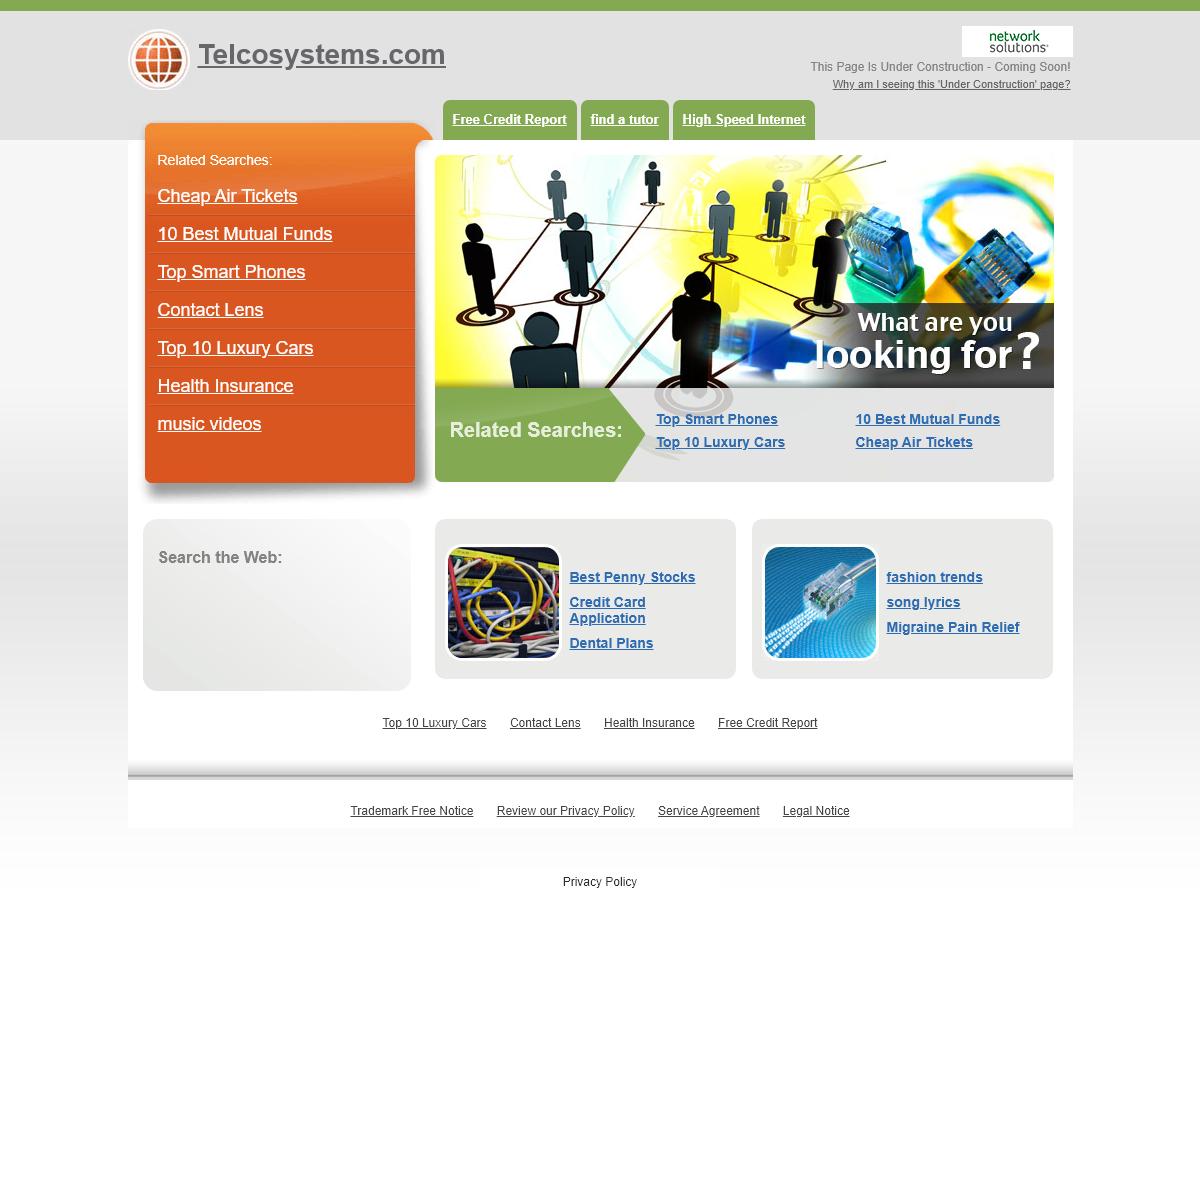 Telcosystems.com